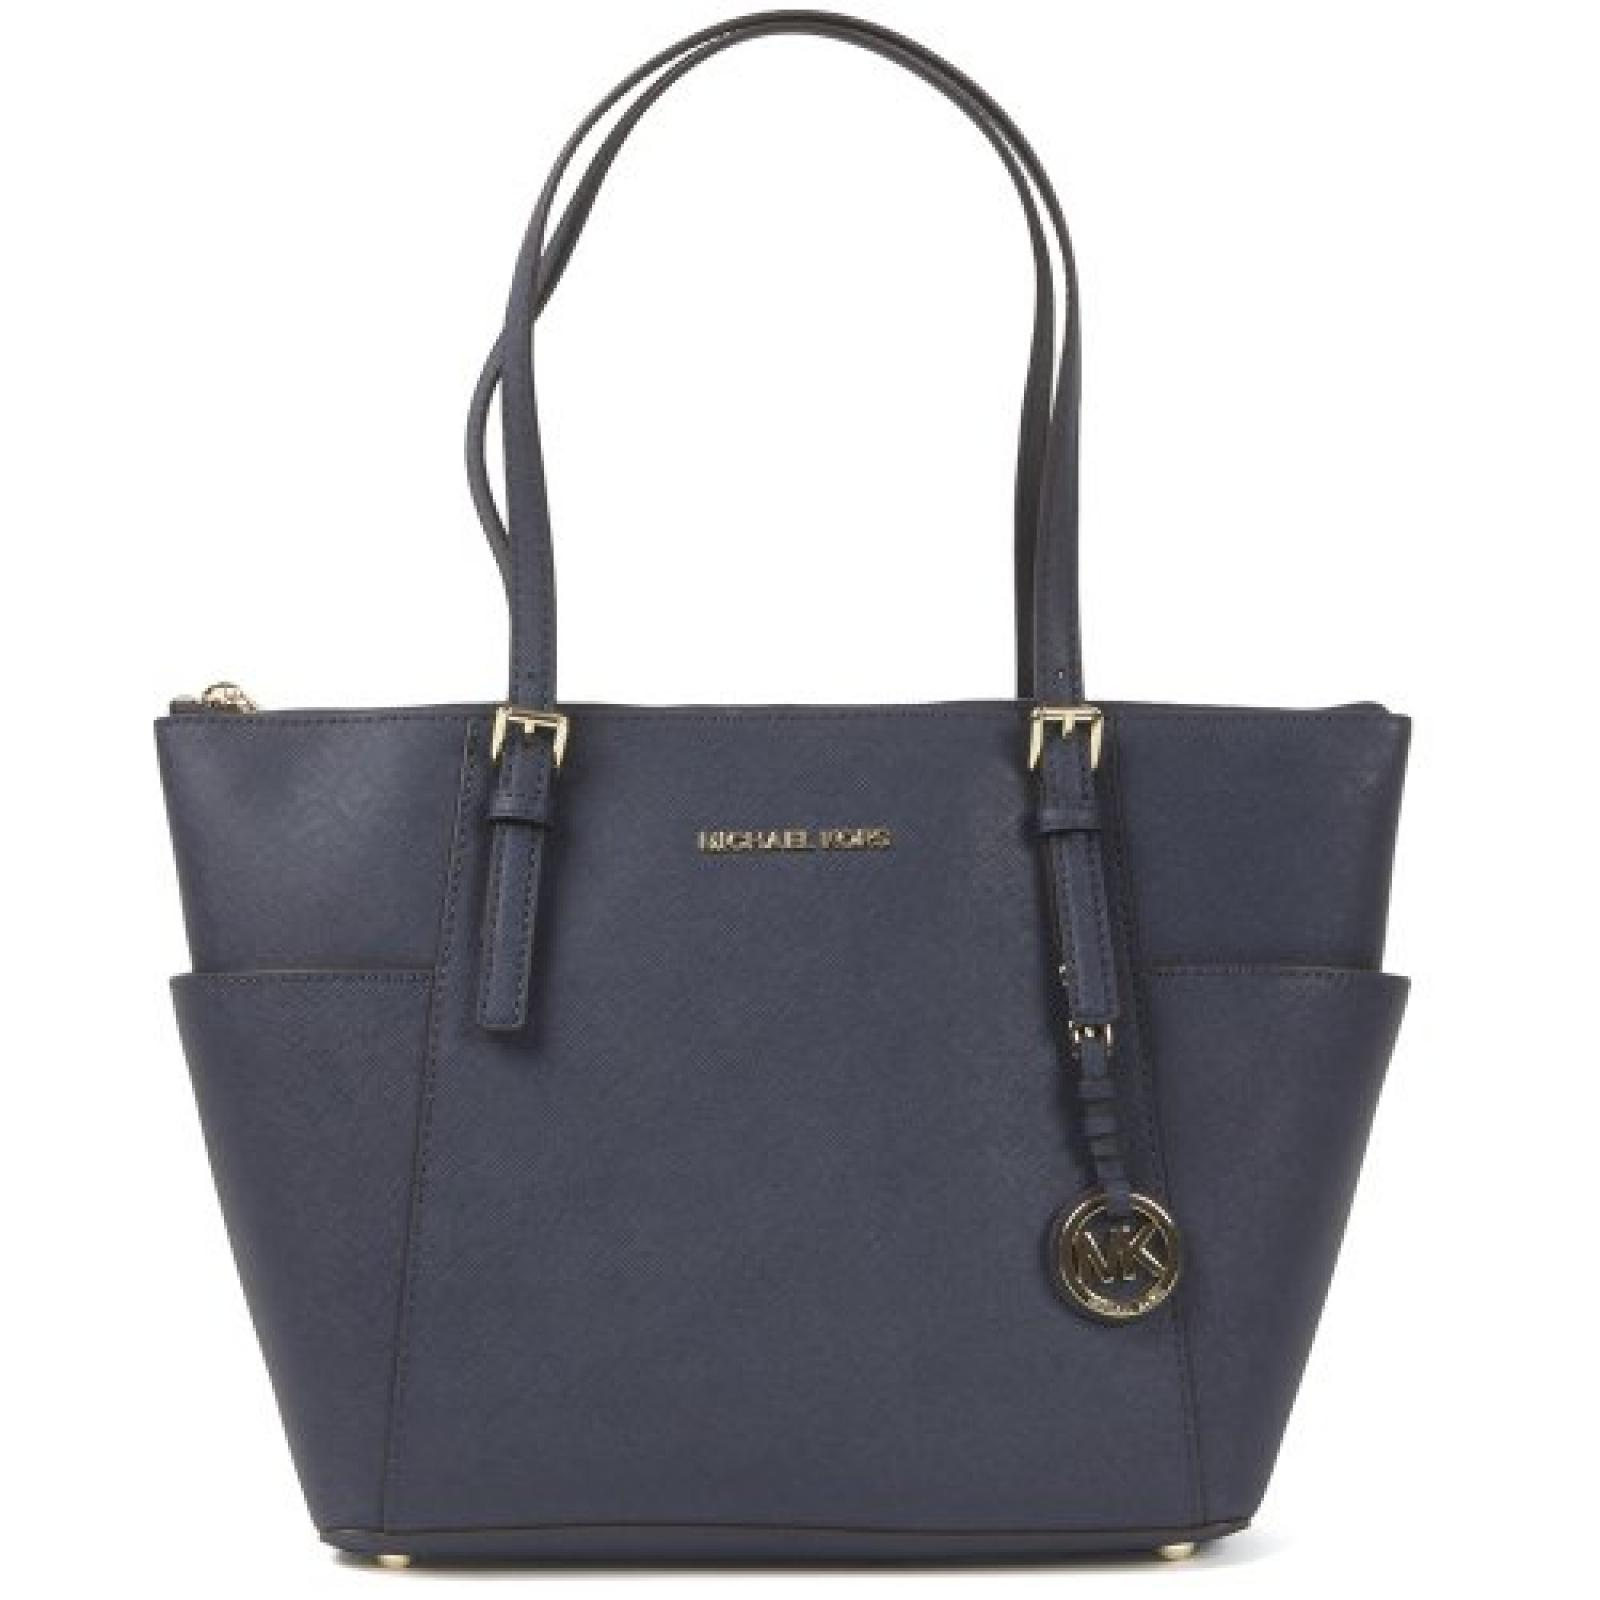 Michael Kors Jet Set Damen Handtasche aus Leder, Blau